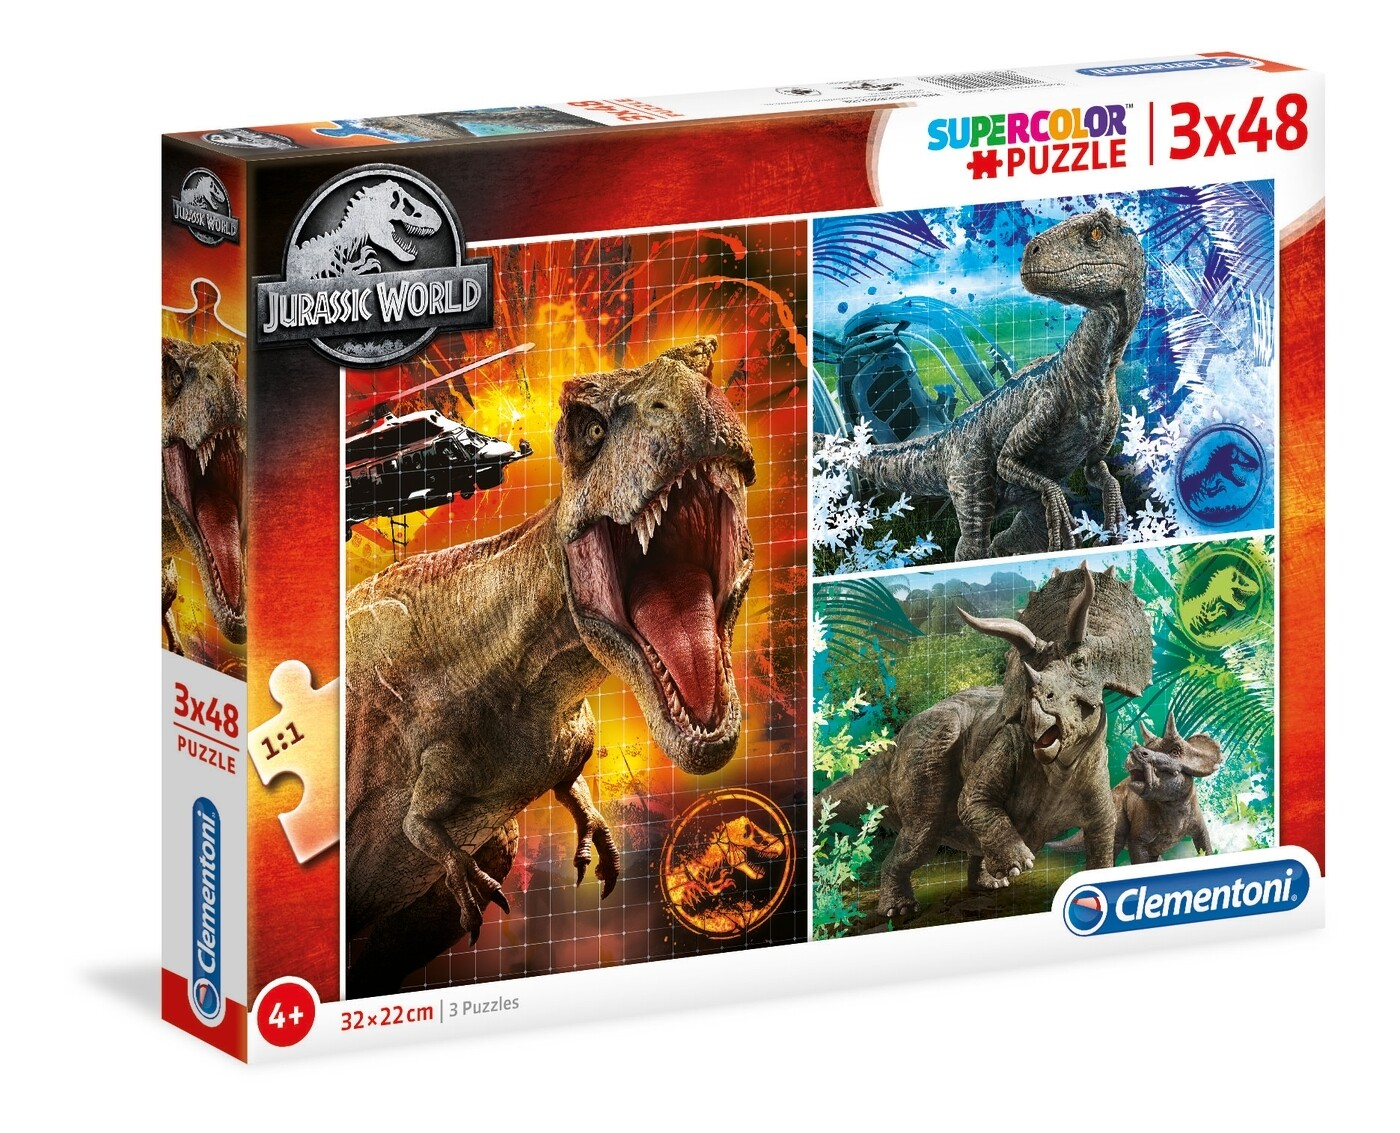 PUZZLE Jurassic World 3x48pcs - CLEMENTONI